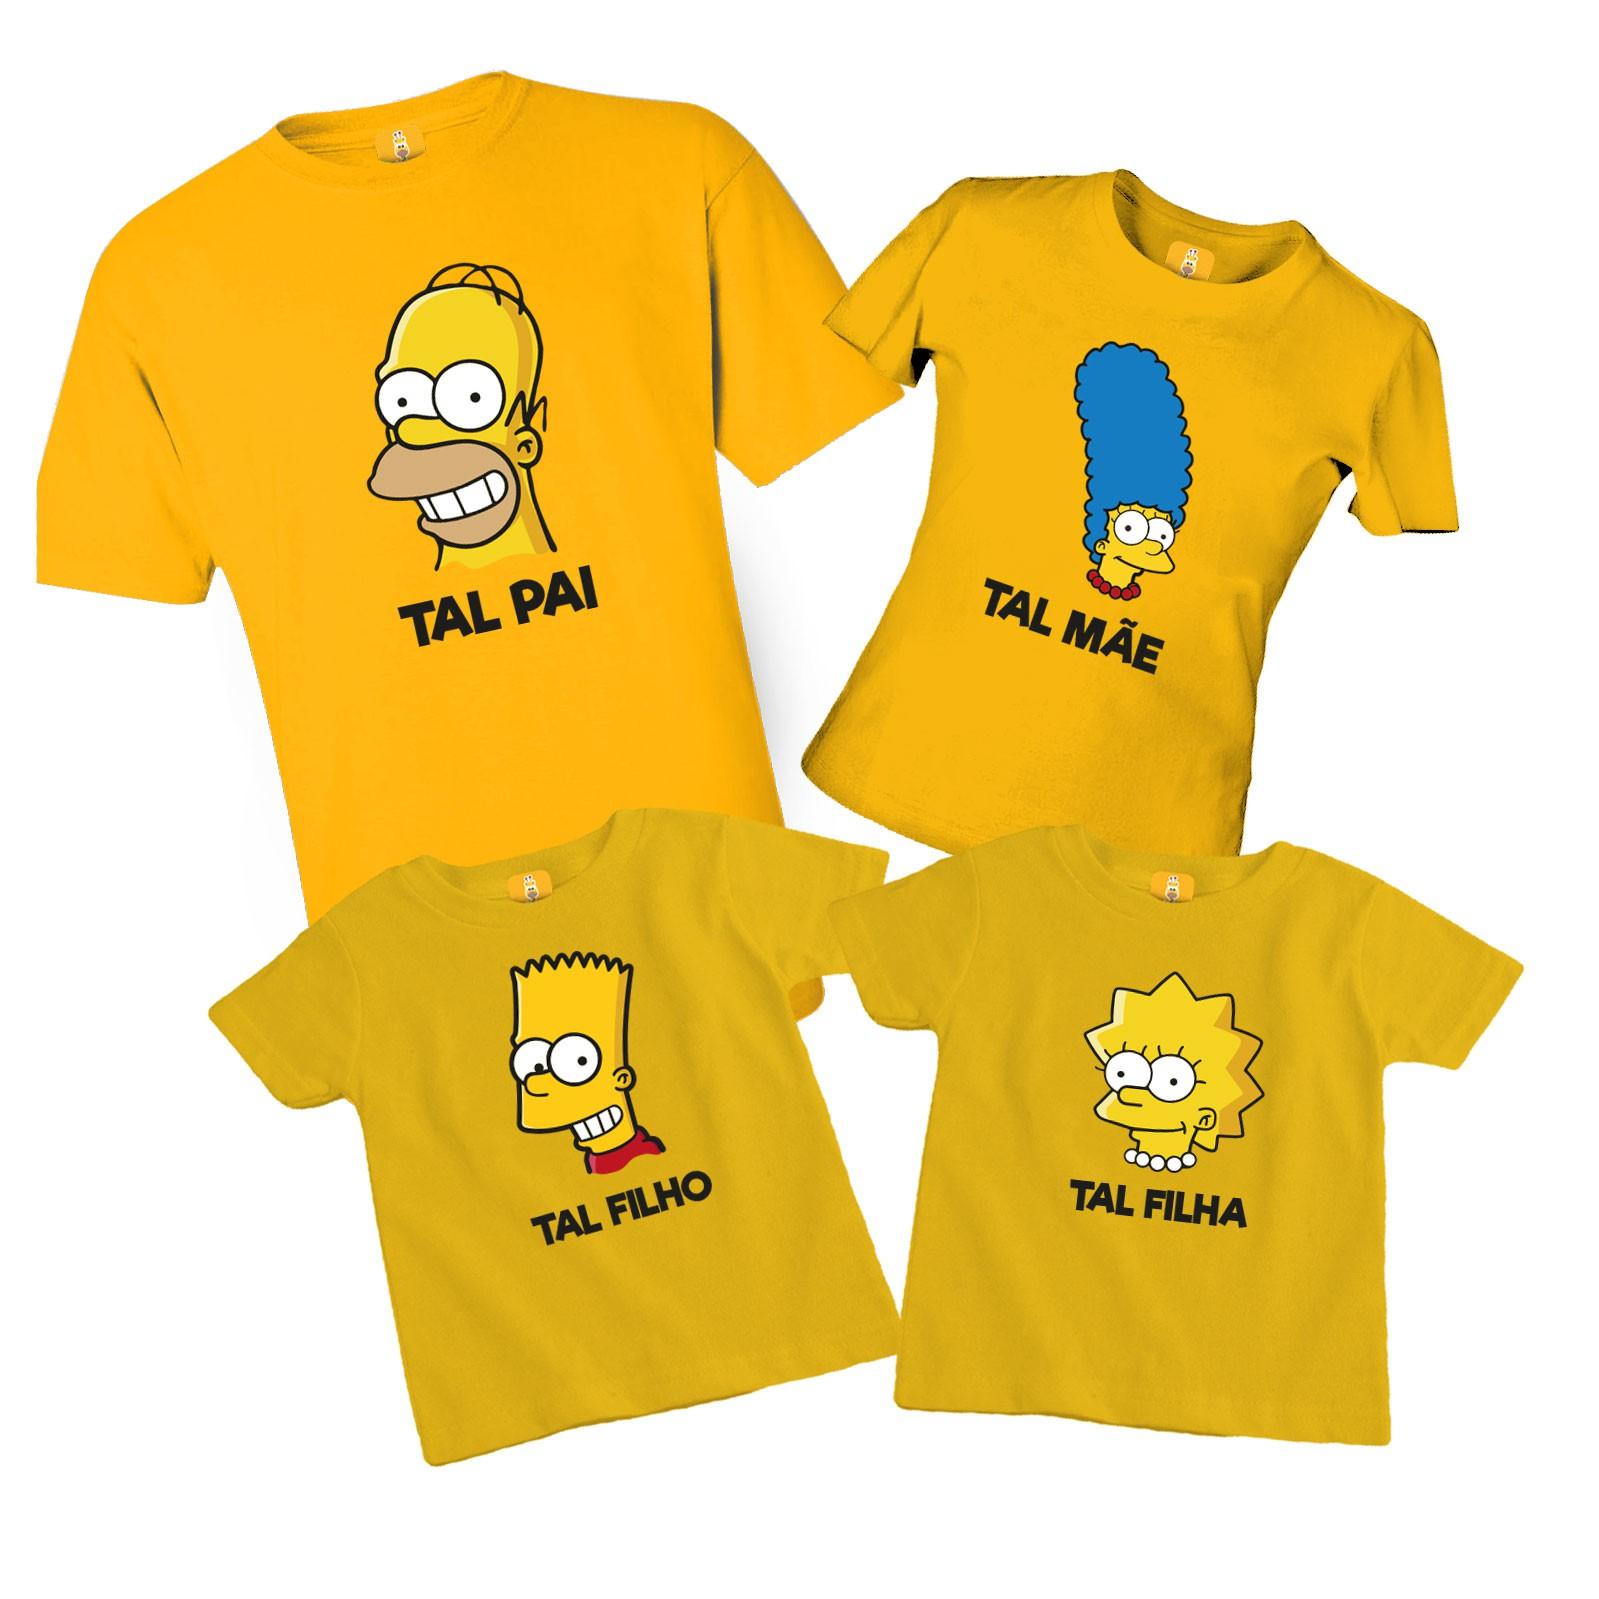 Kit Camiseta Simpsons com 4 peças